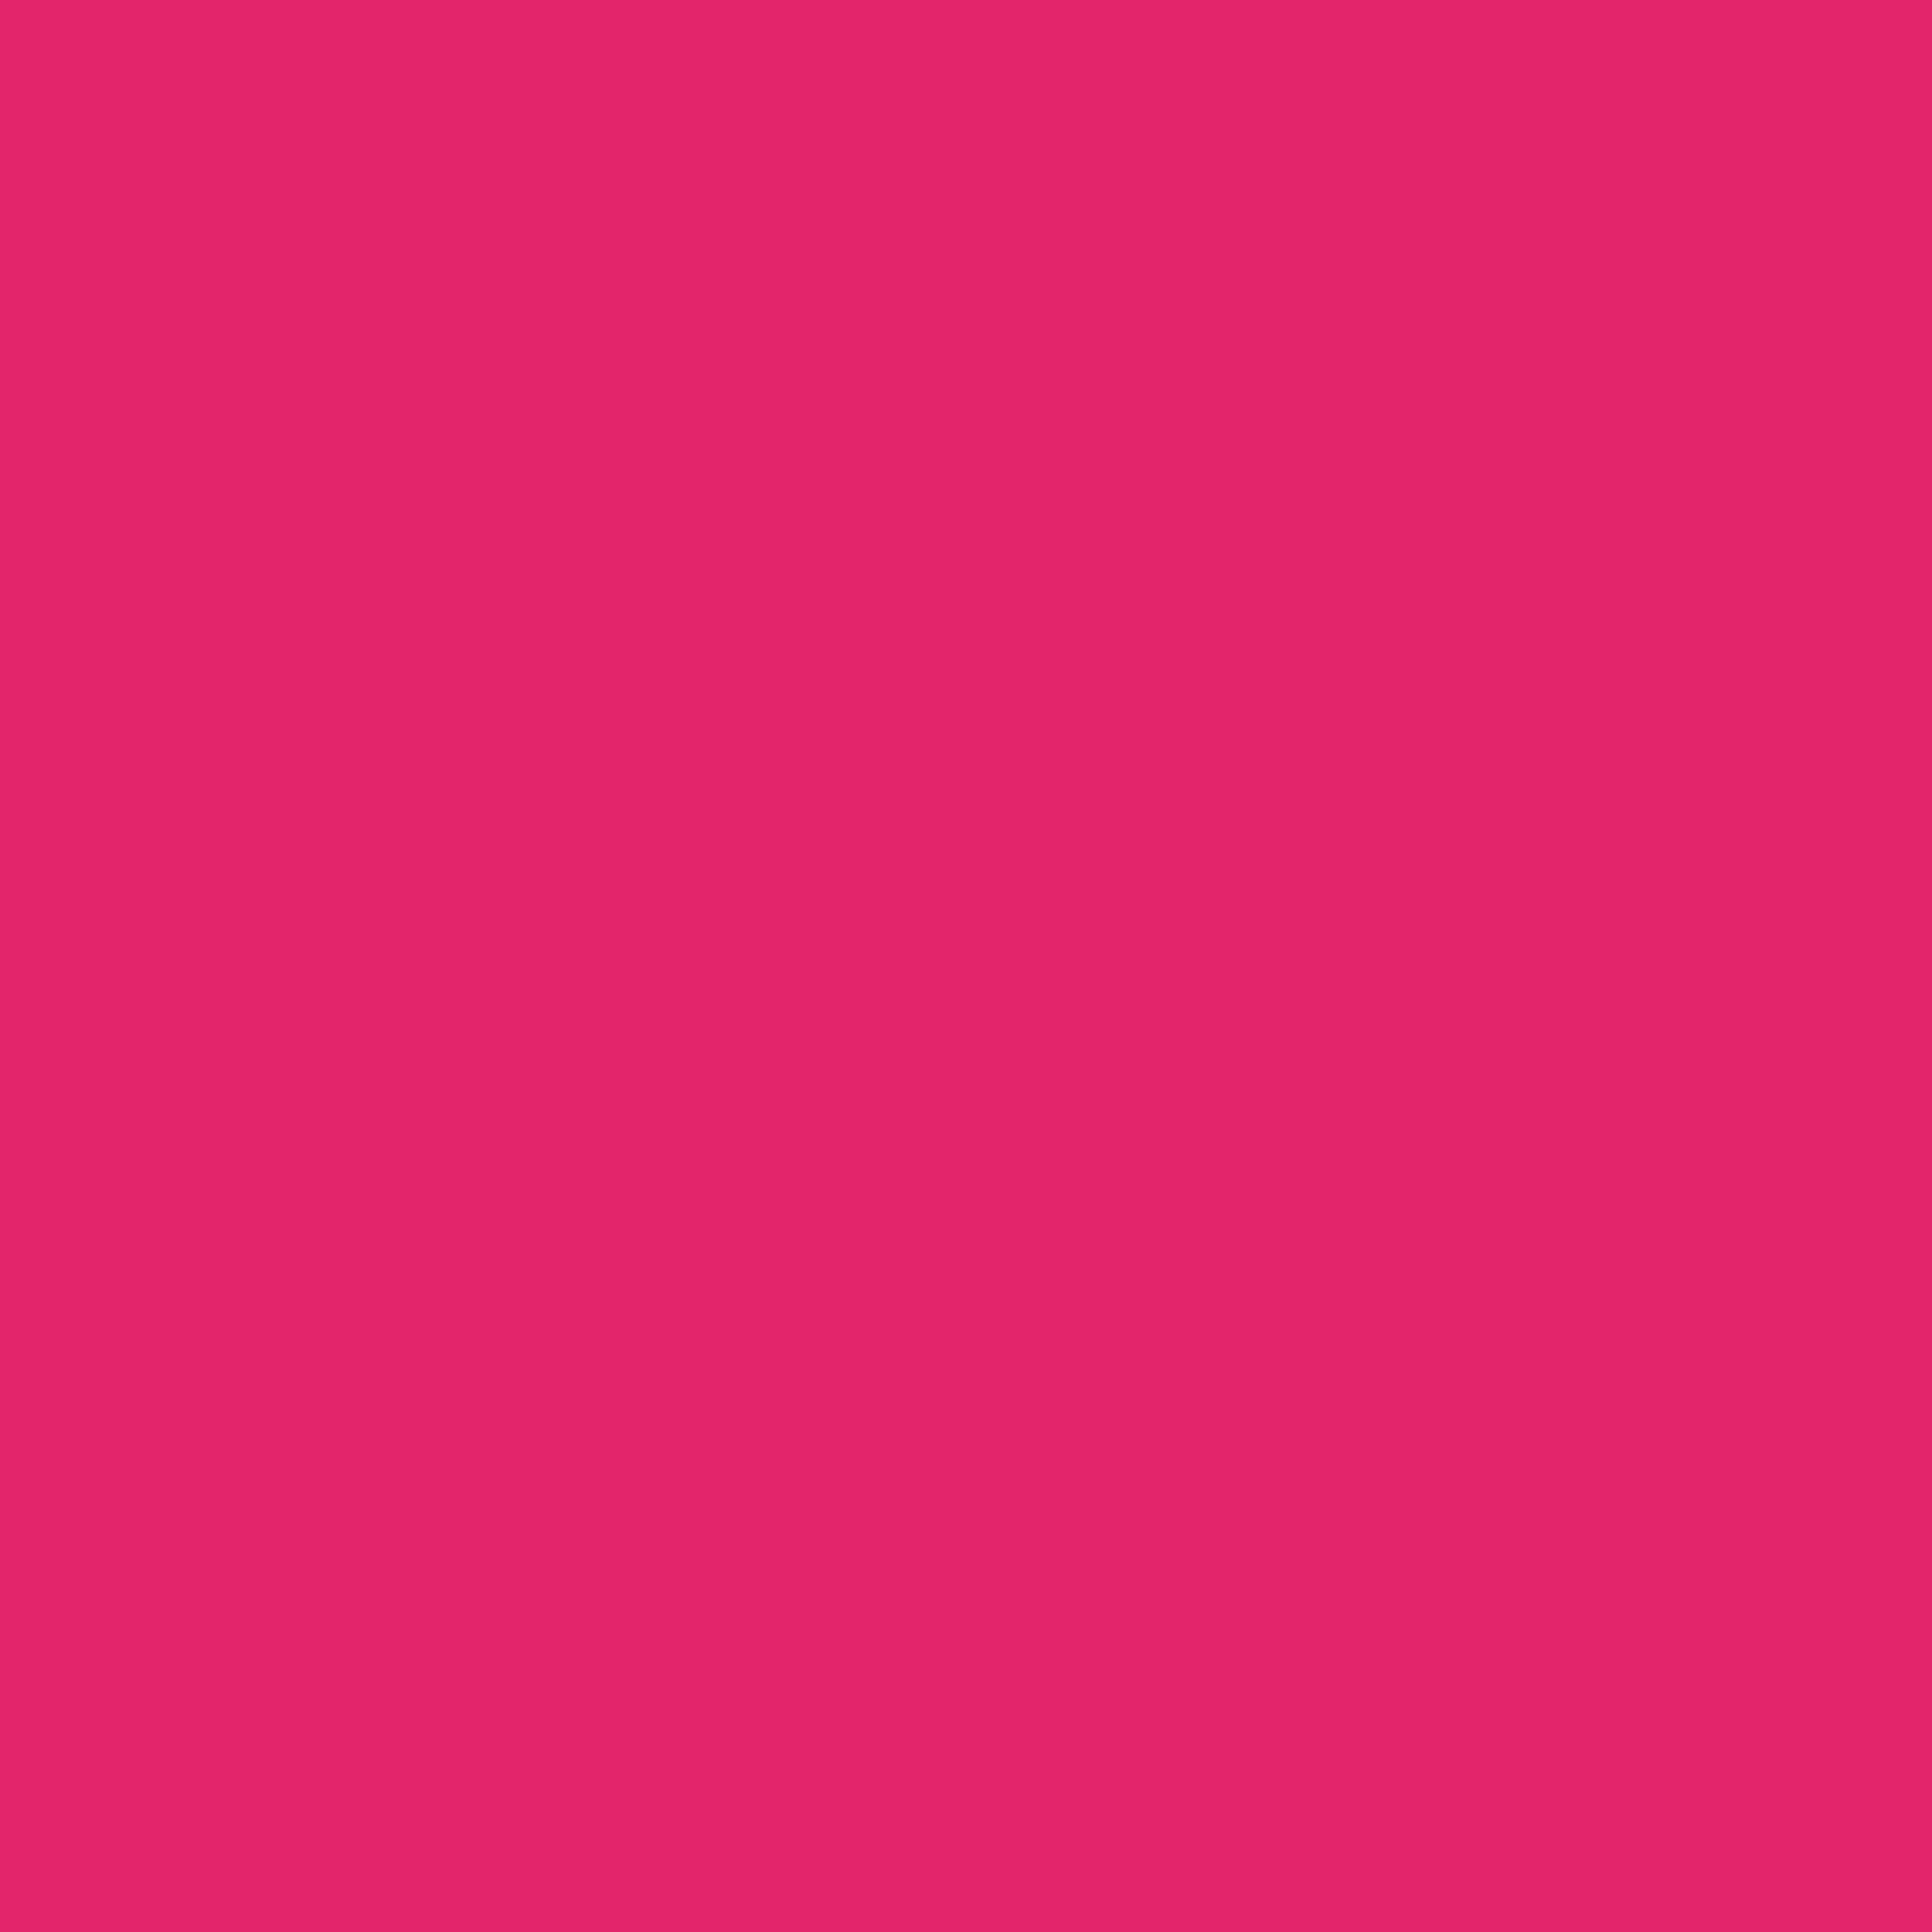 3600x3600 Razzmatazz Solid Color Background